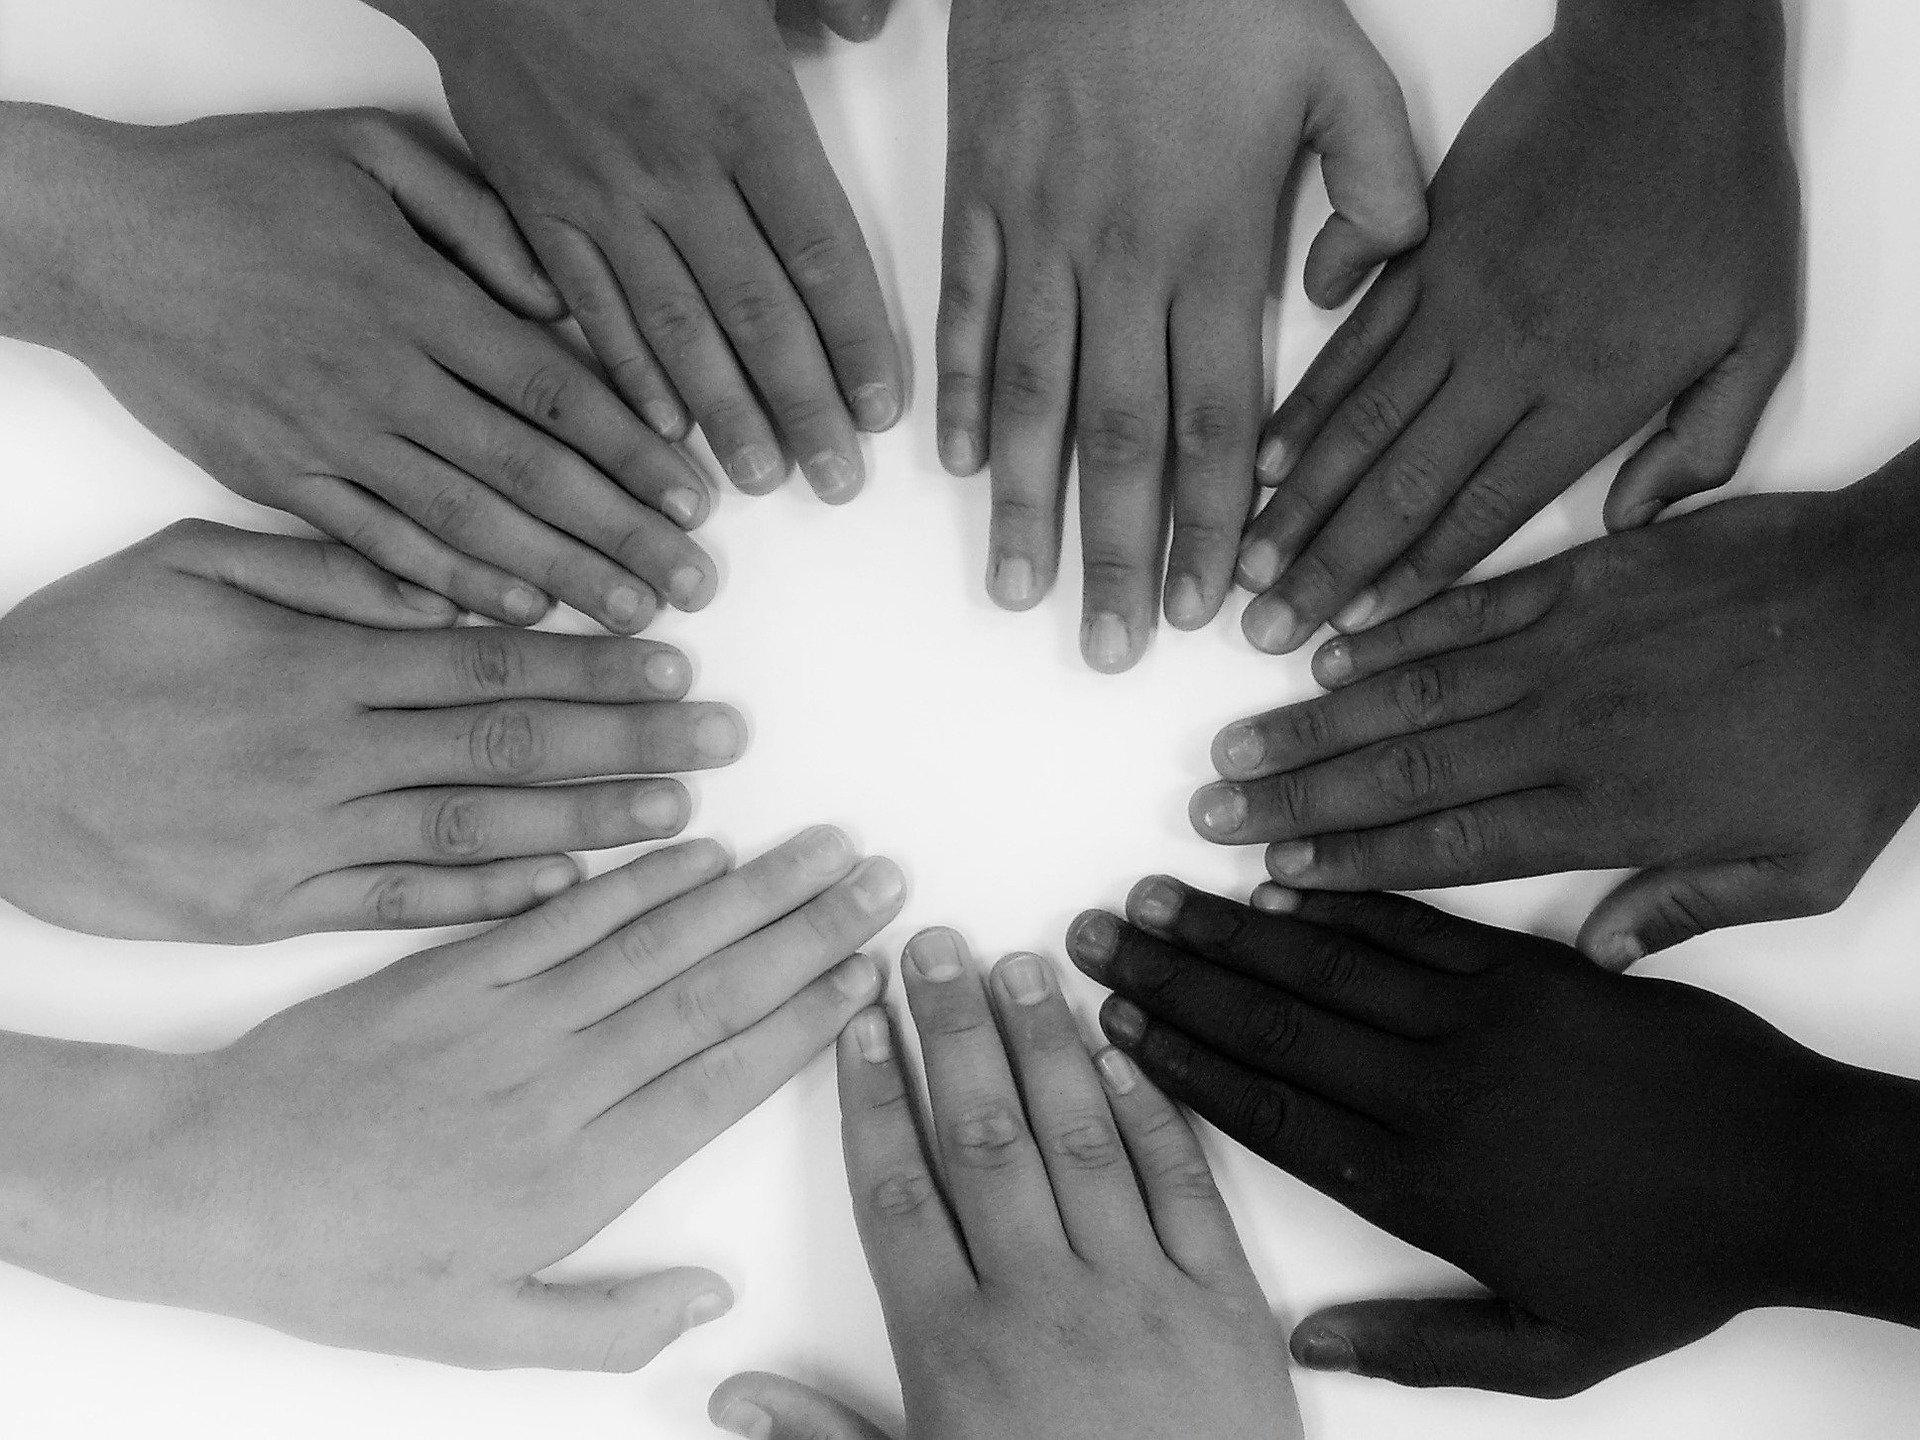 Unity & Humanity